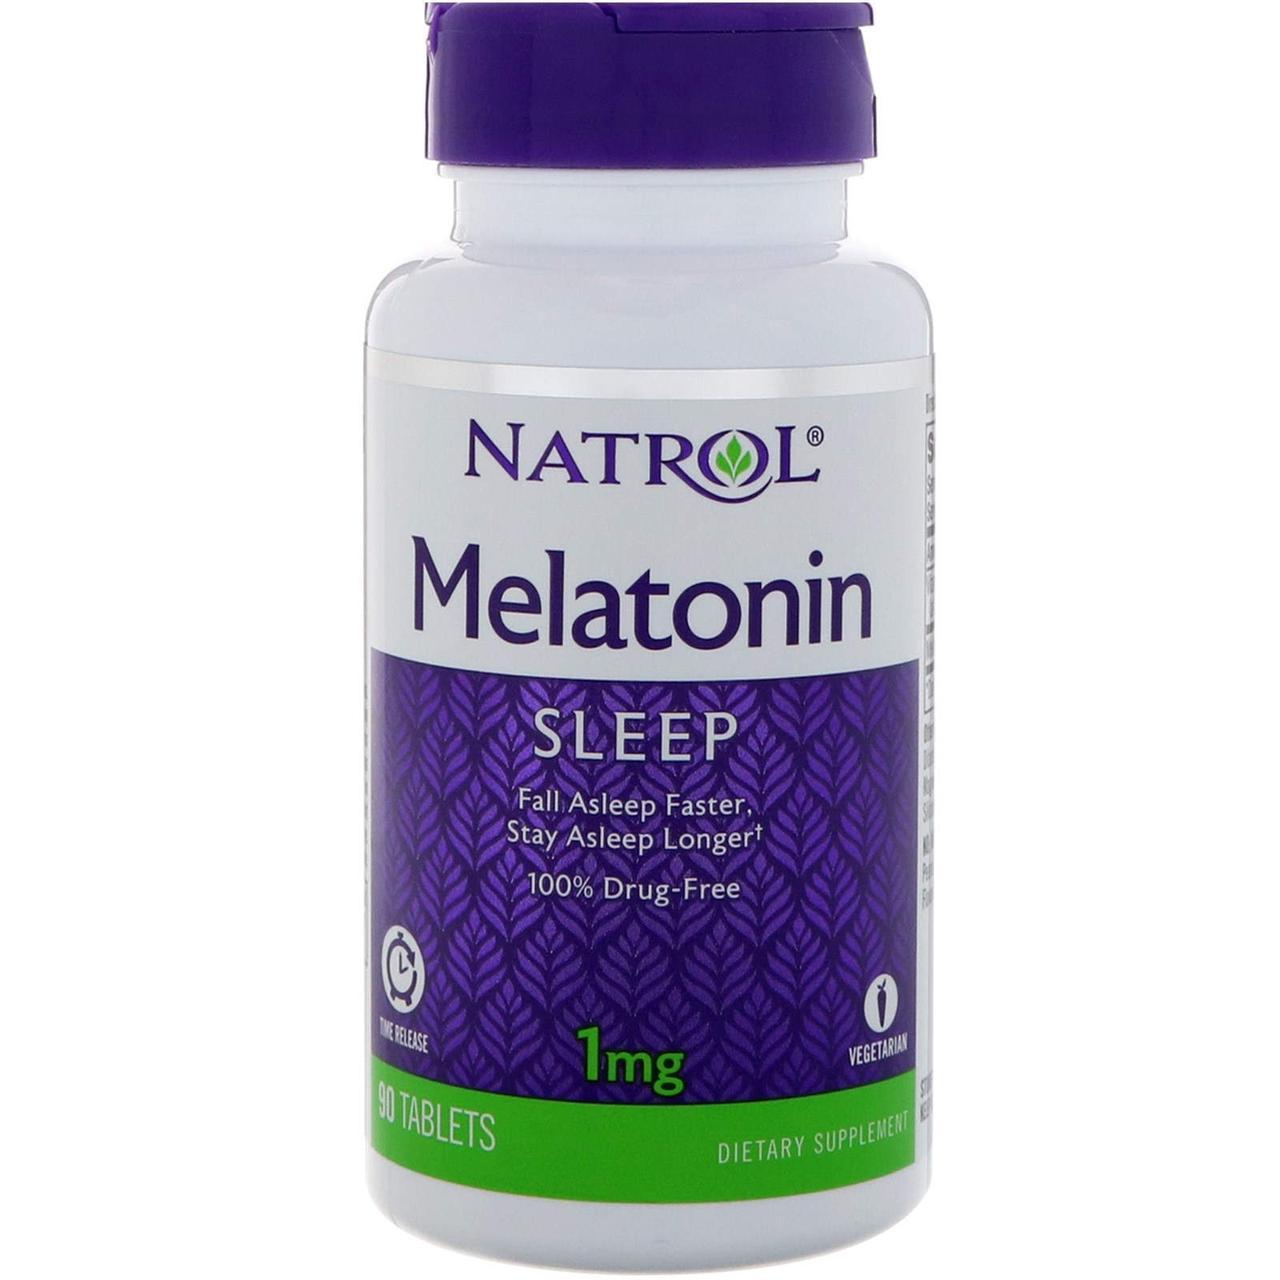 Мелатонин, Natrol, Melatonin, 1 мг, 90 таблеток (КОД:10847)